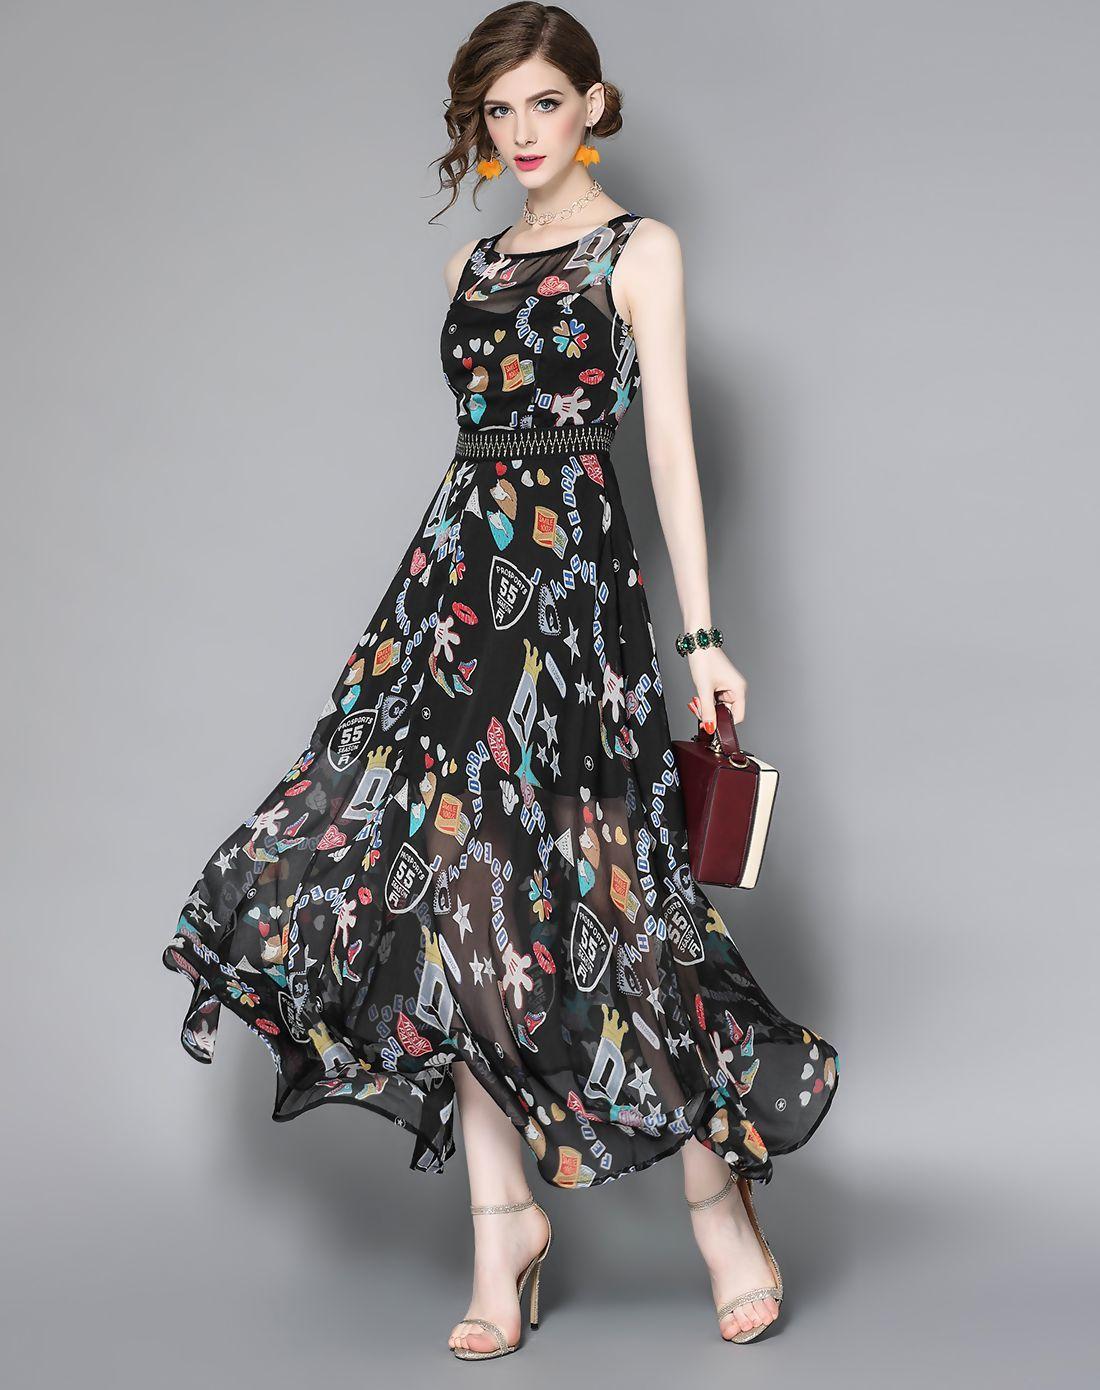 Adorewe vipme aline dressesdesigner wlzd black chiffon printed